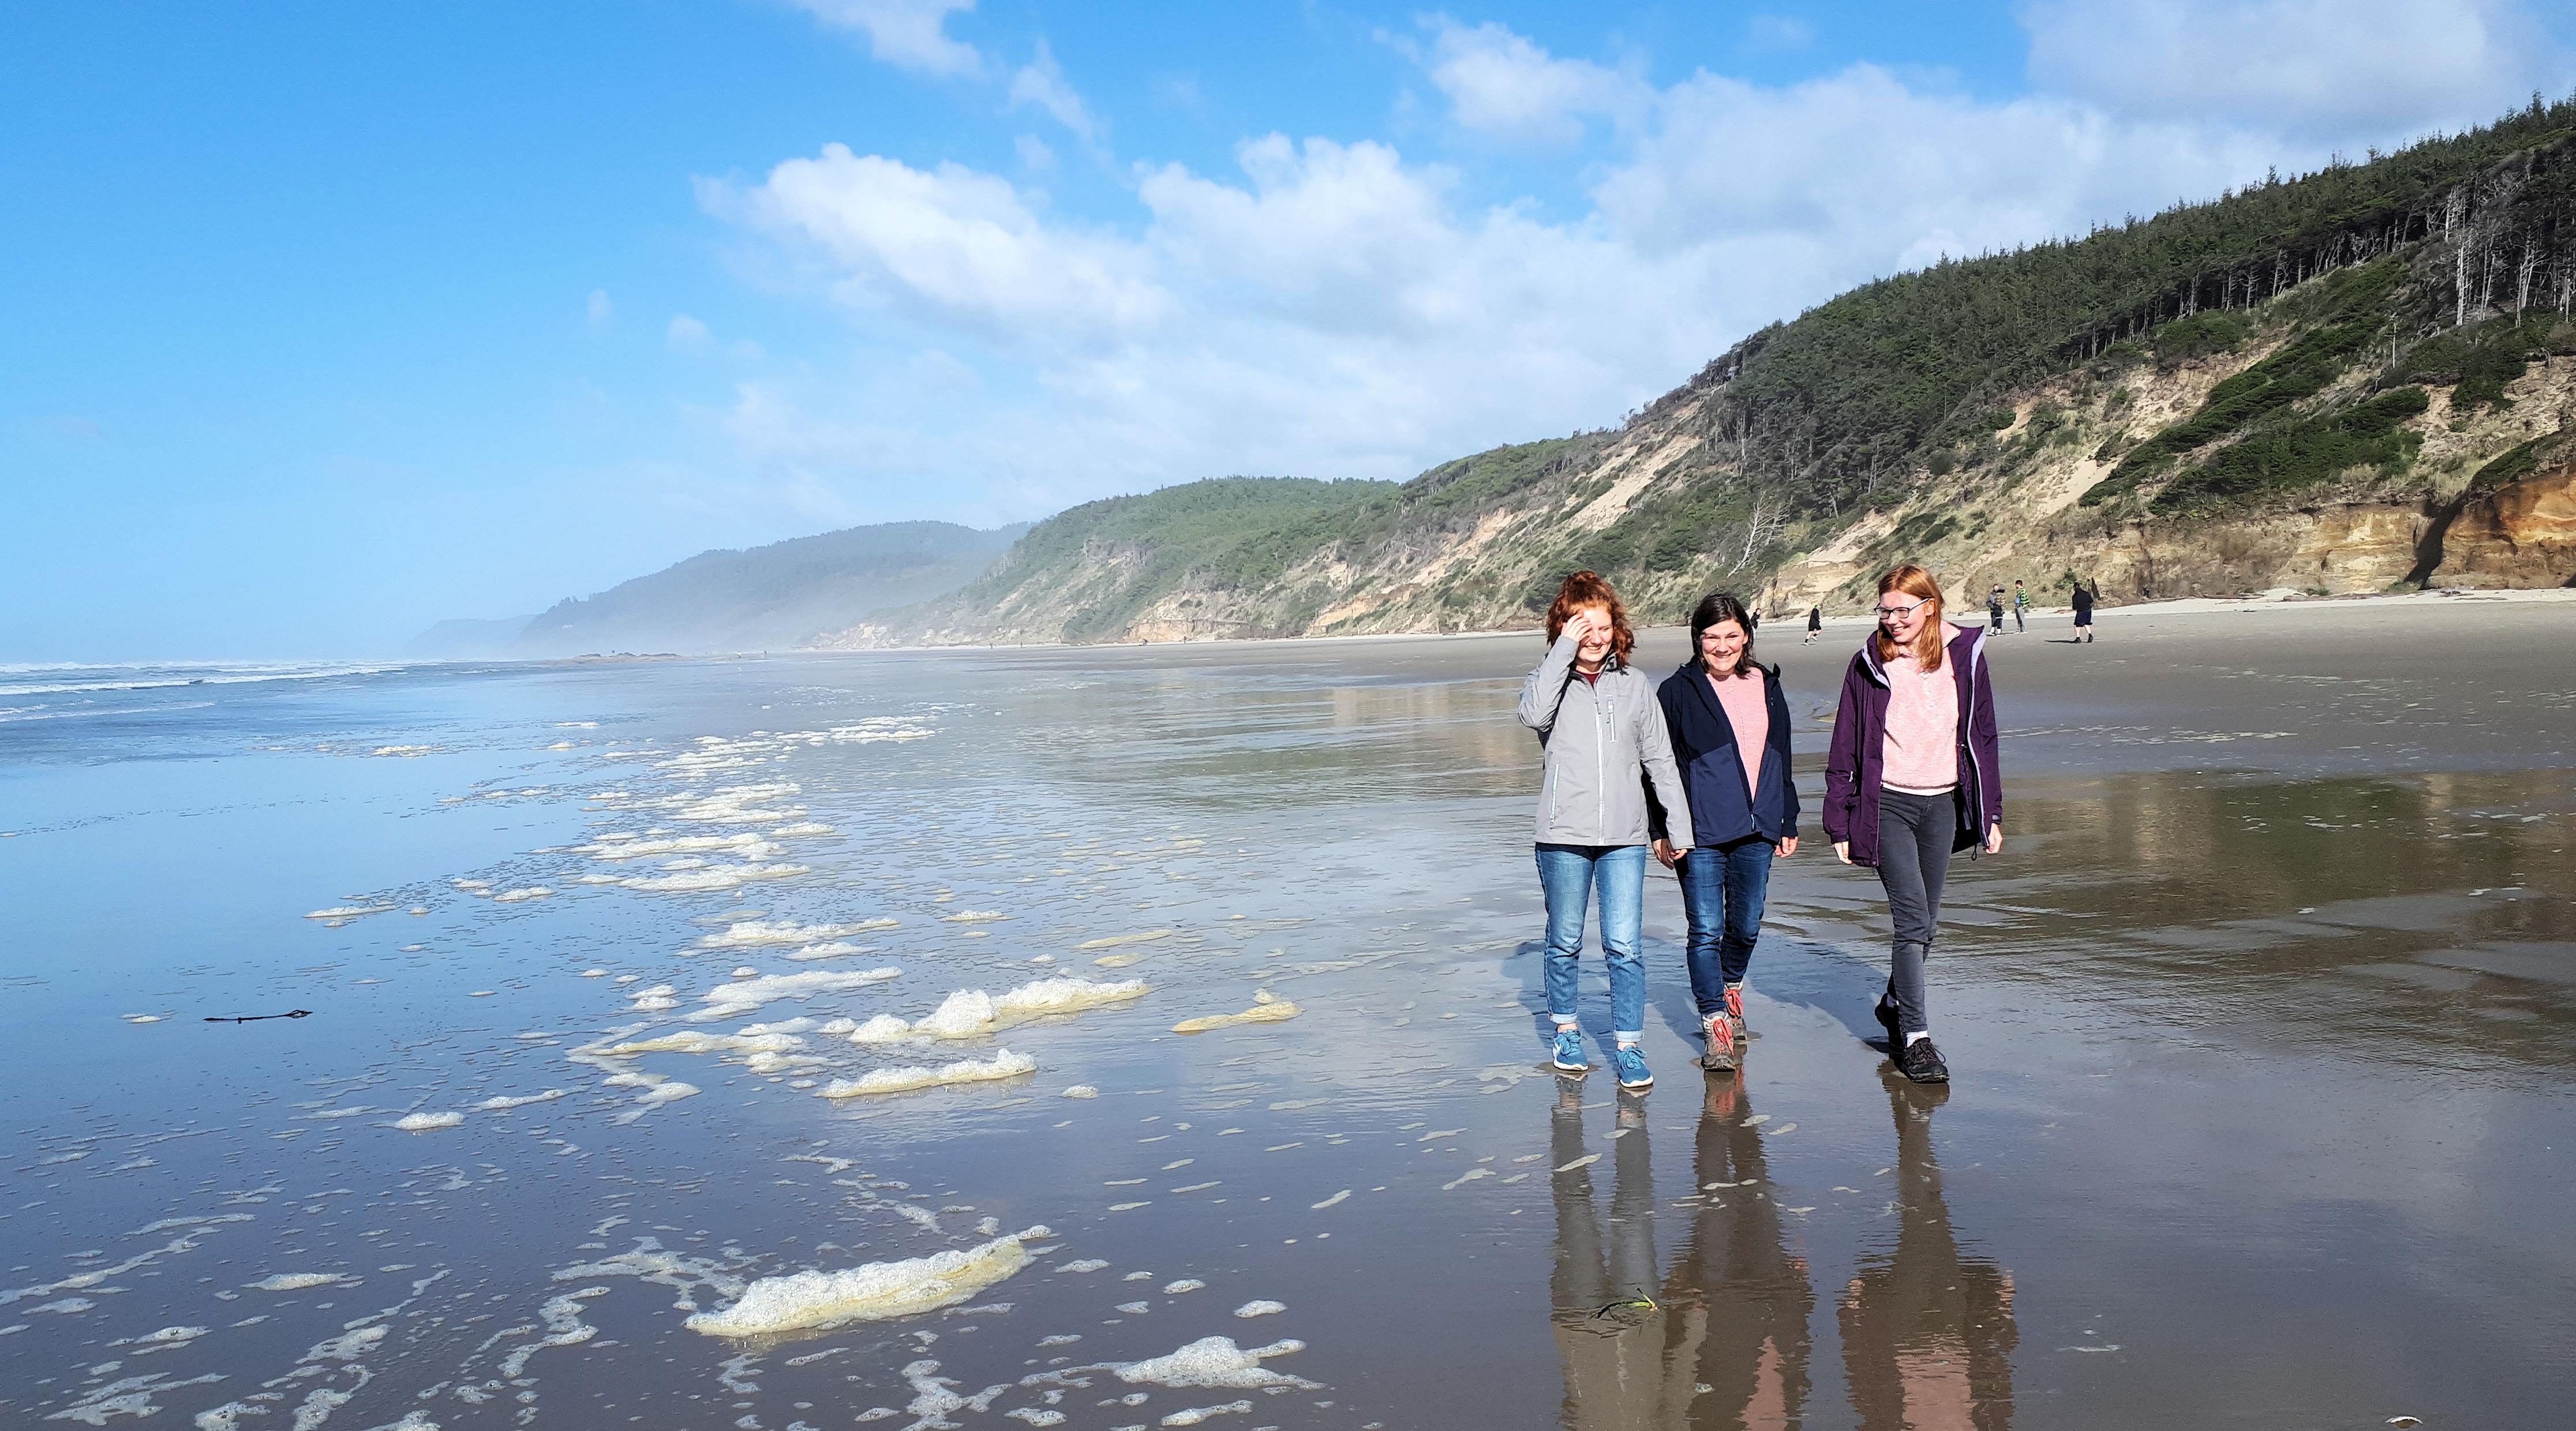 Hobbit's Trail Beach